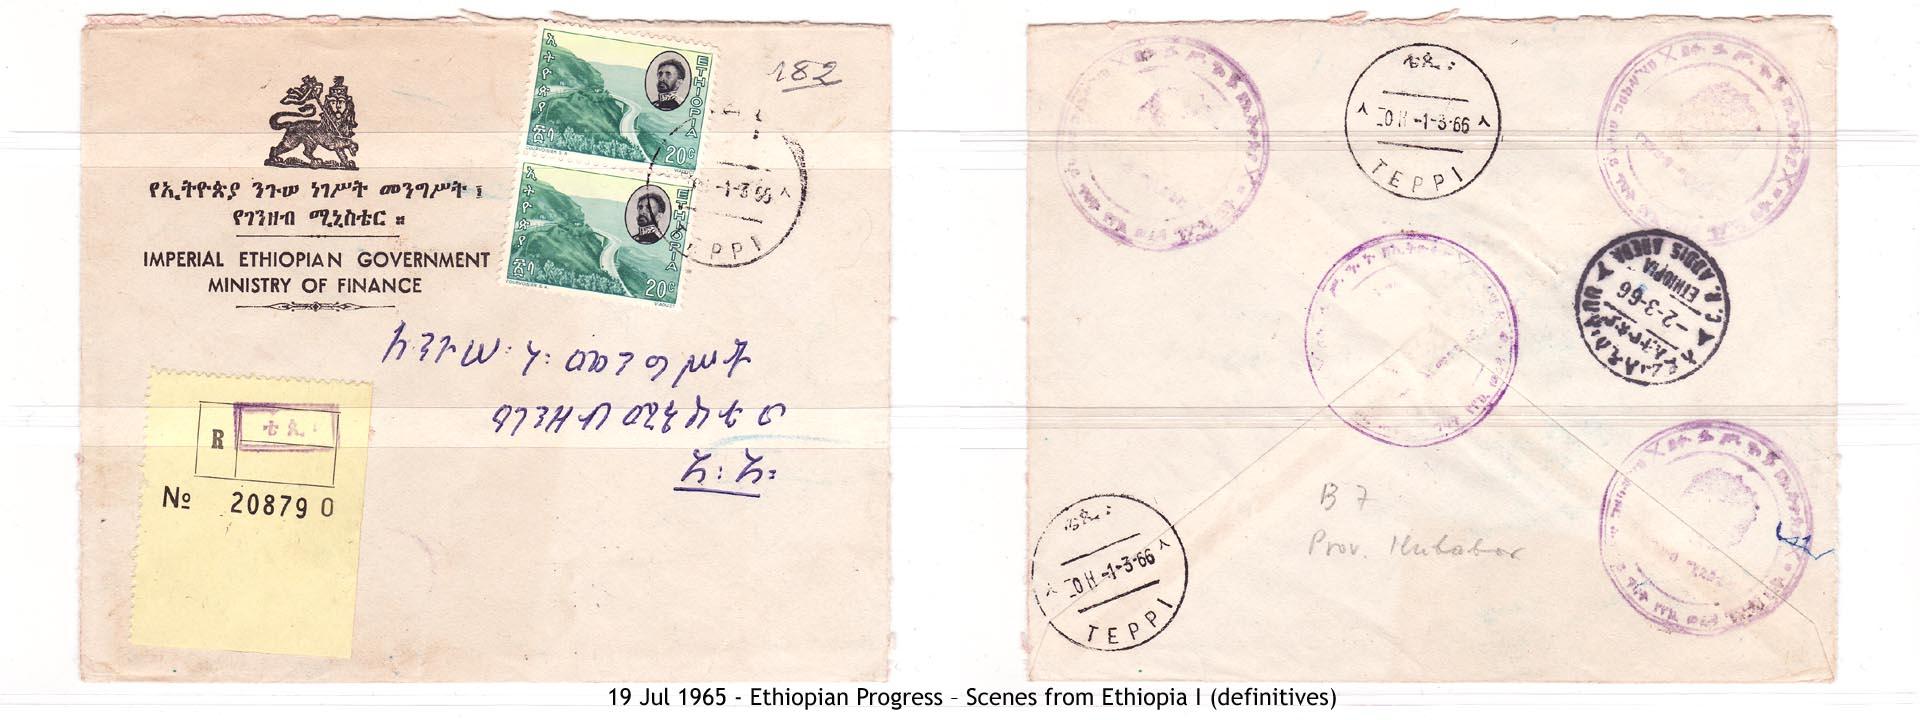 19650719 - Ethiopian Progress – Scenes from Ethiopia I (definitives)